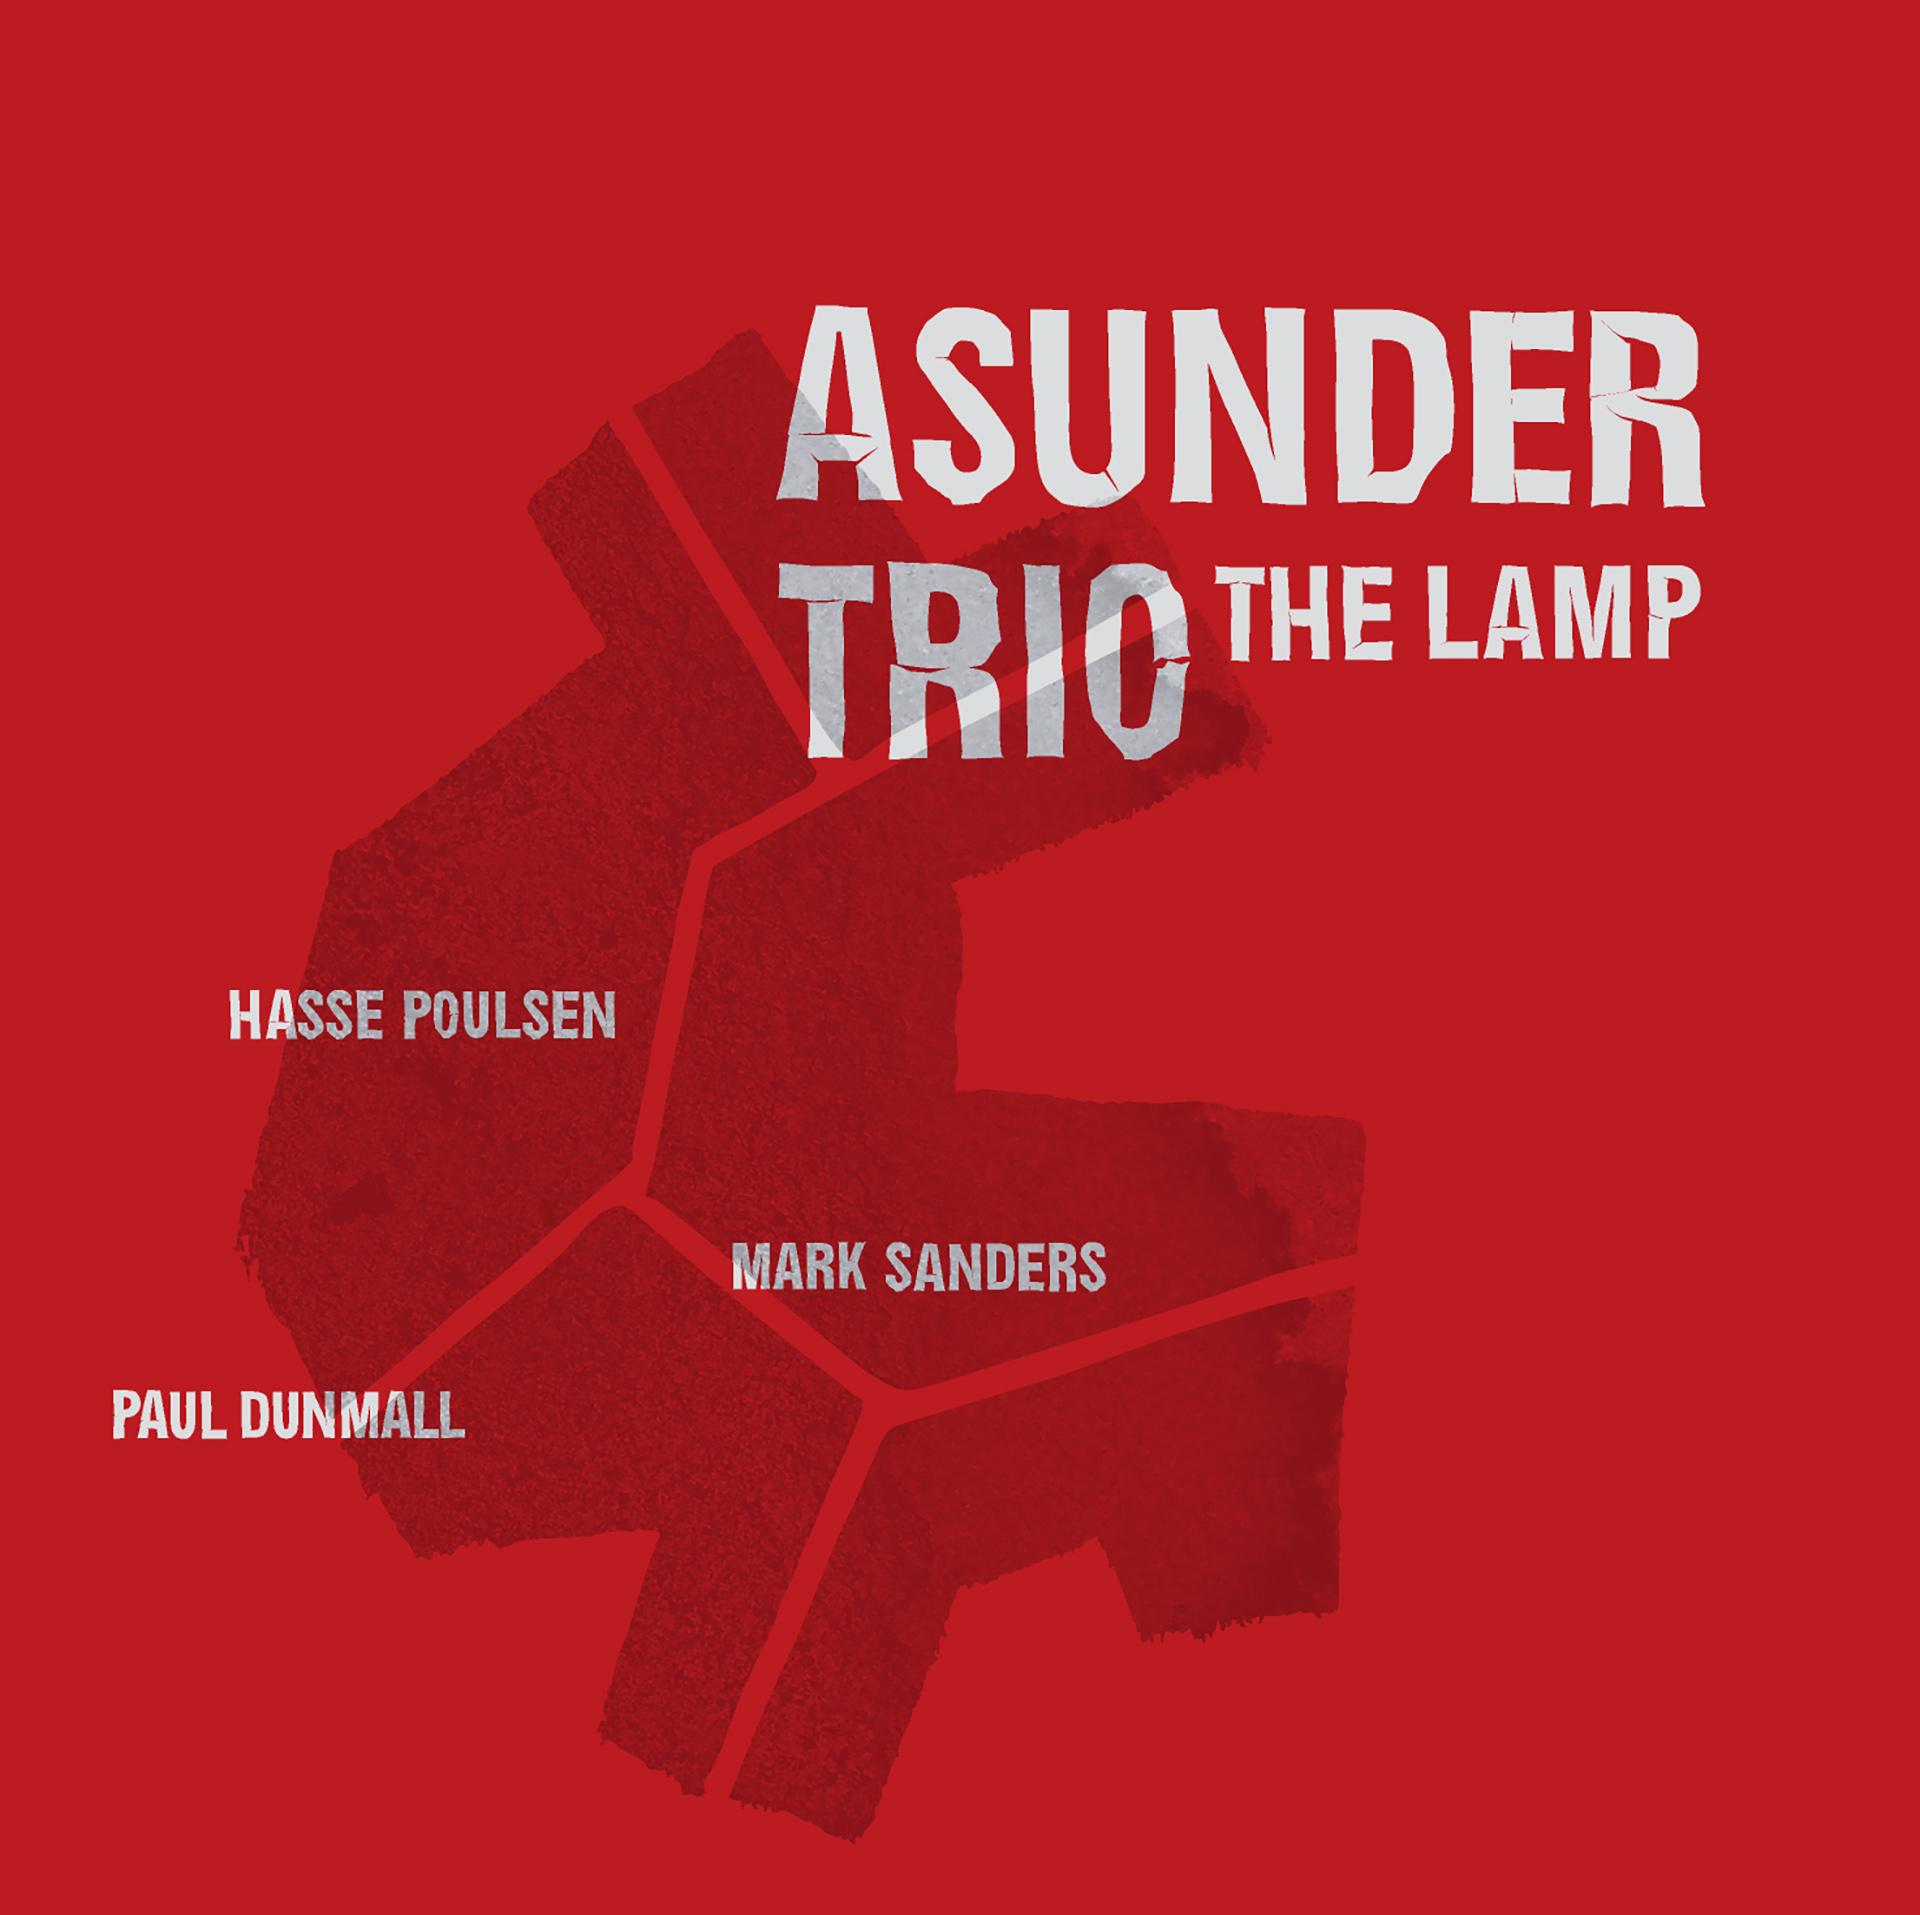 ASUNDER TRIO – THE LAMP